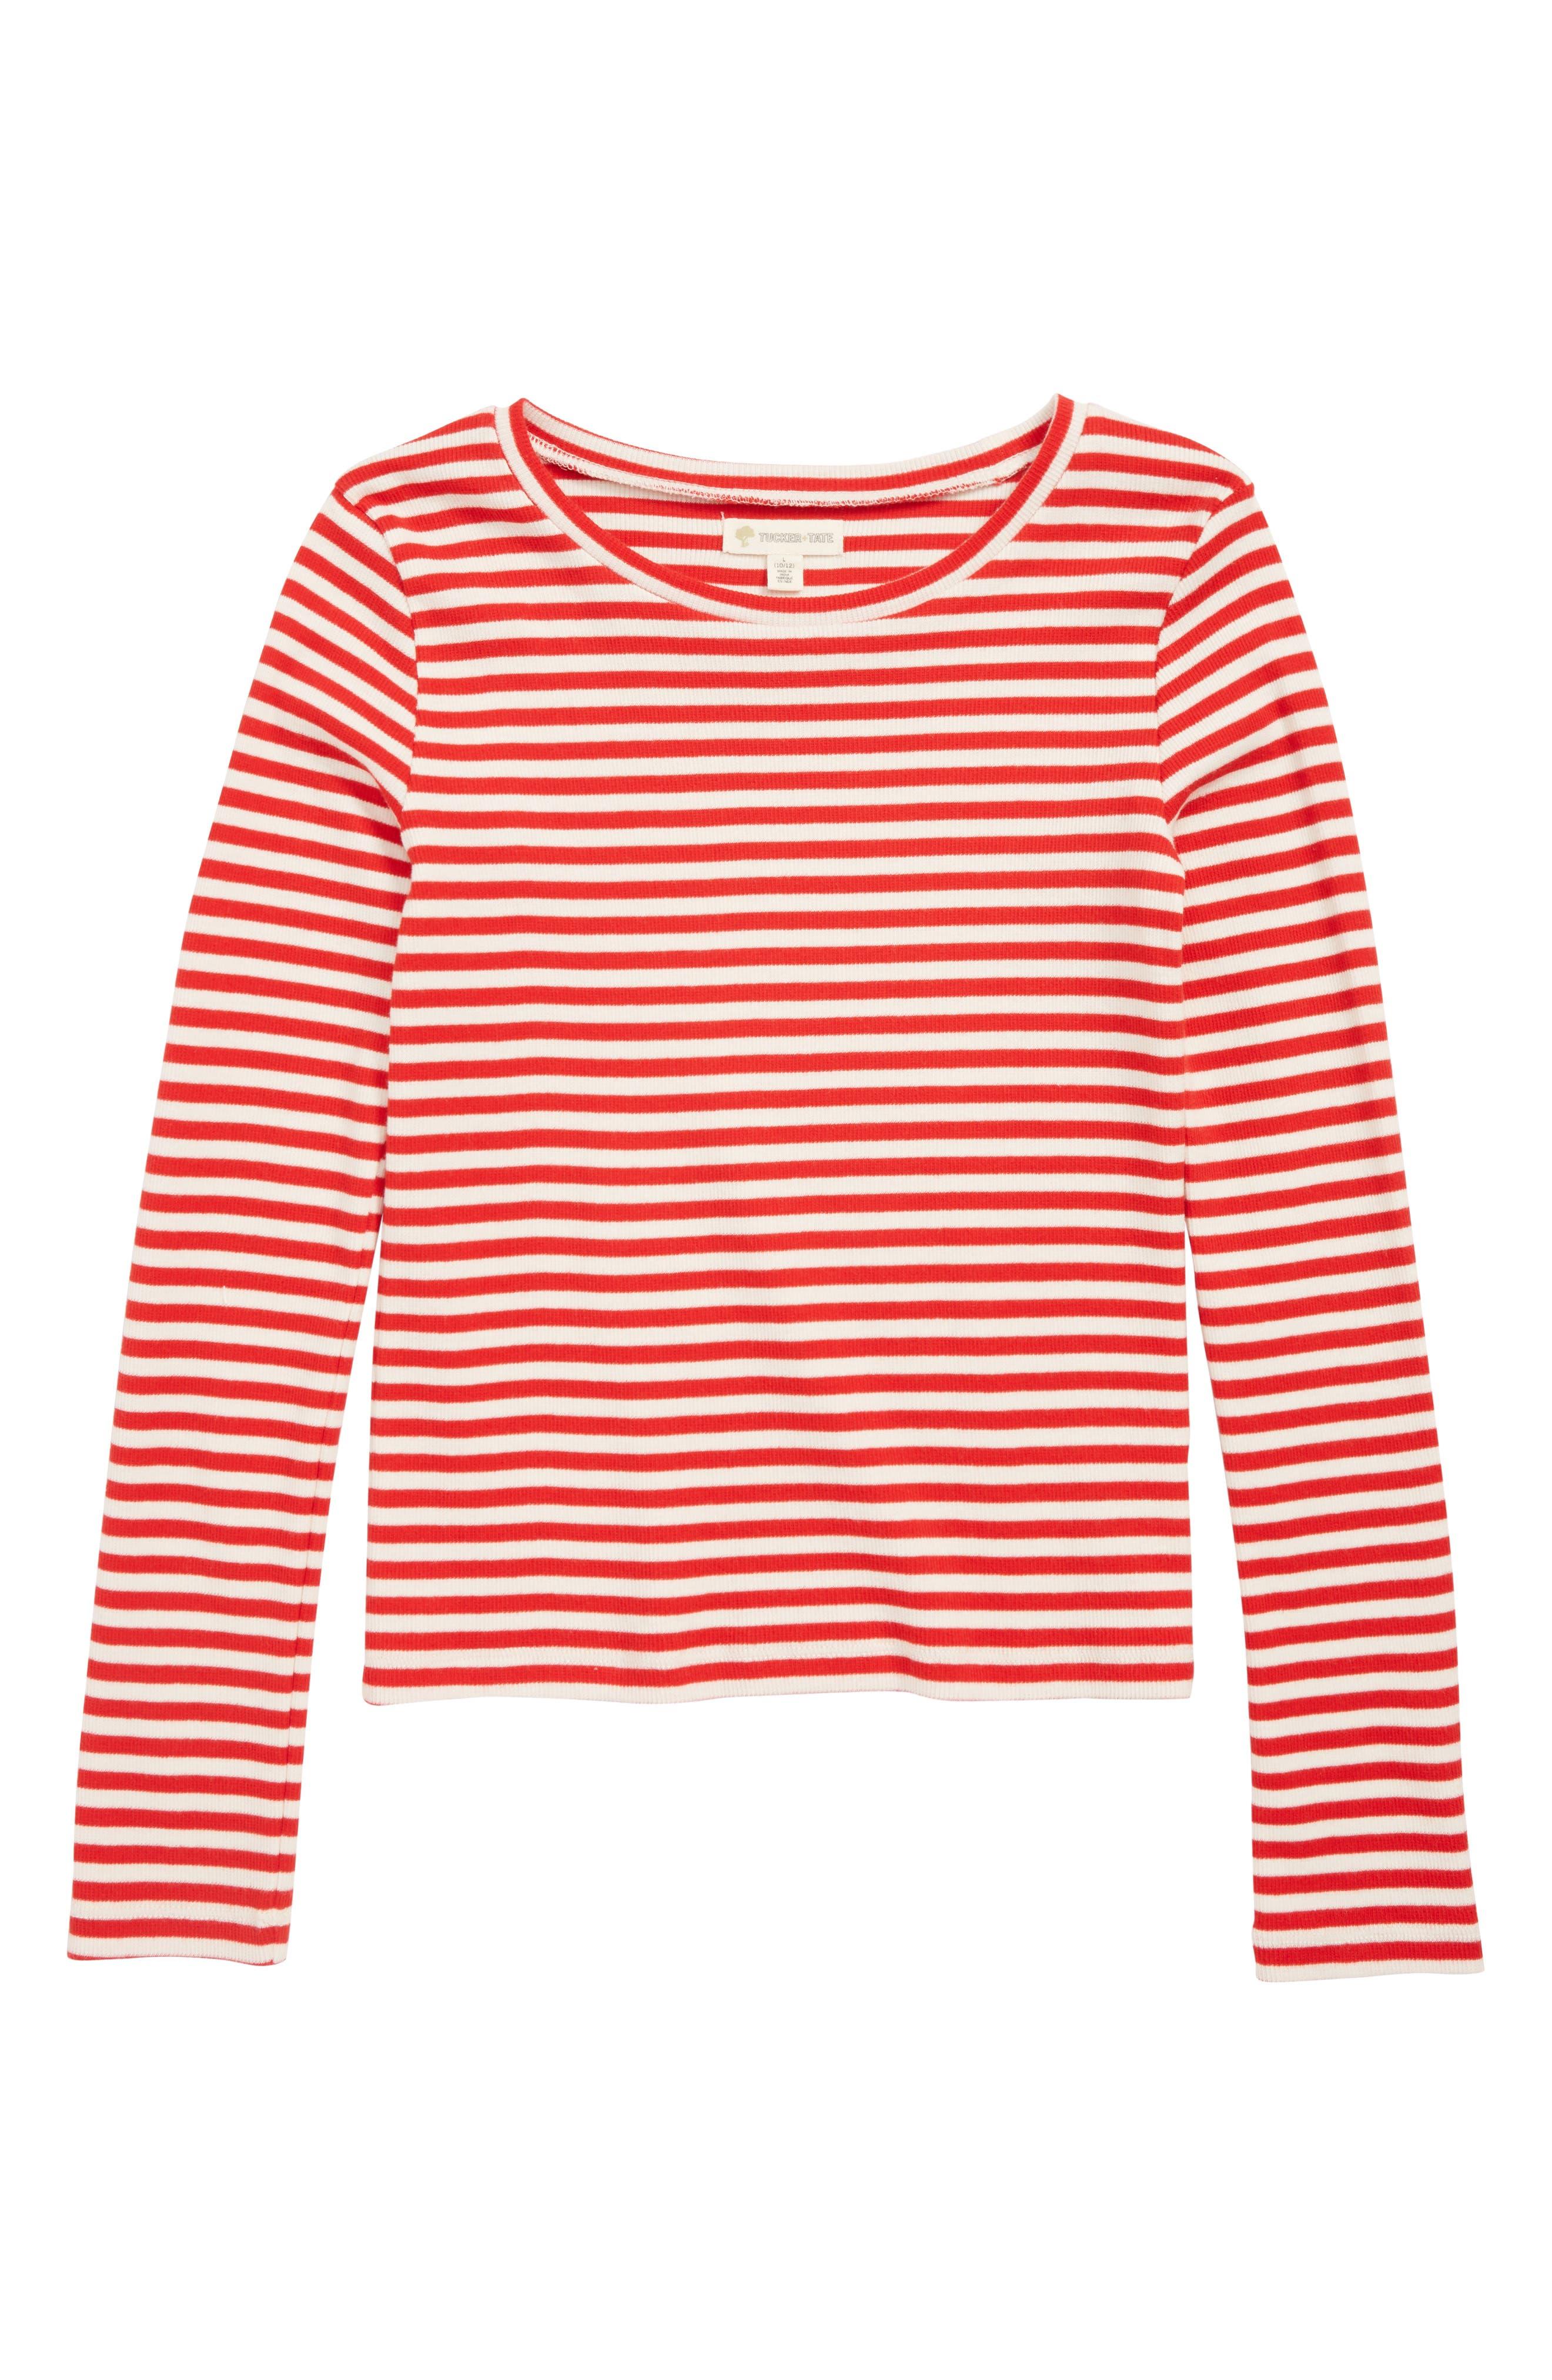 Rib Knit Top,                         Main,                         color, RED PEPPER STRIPE